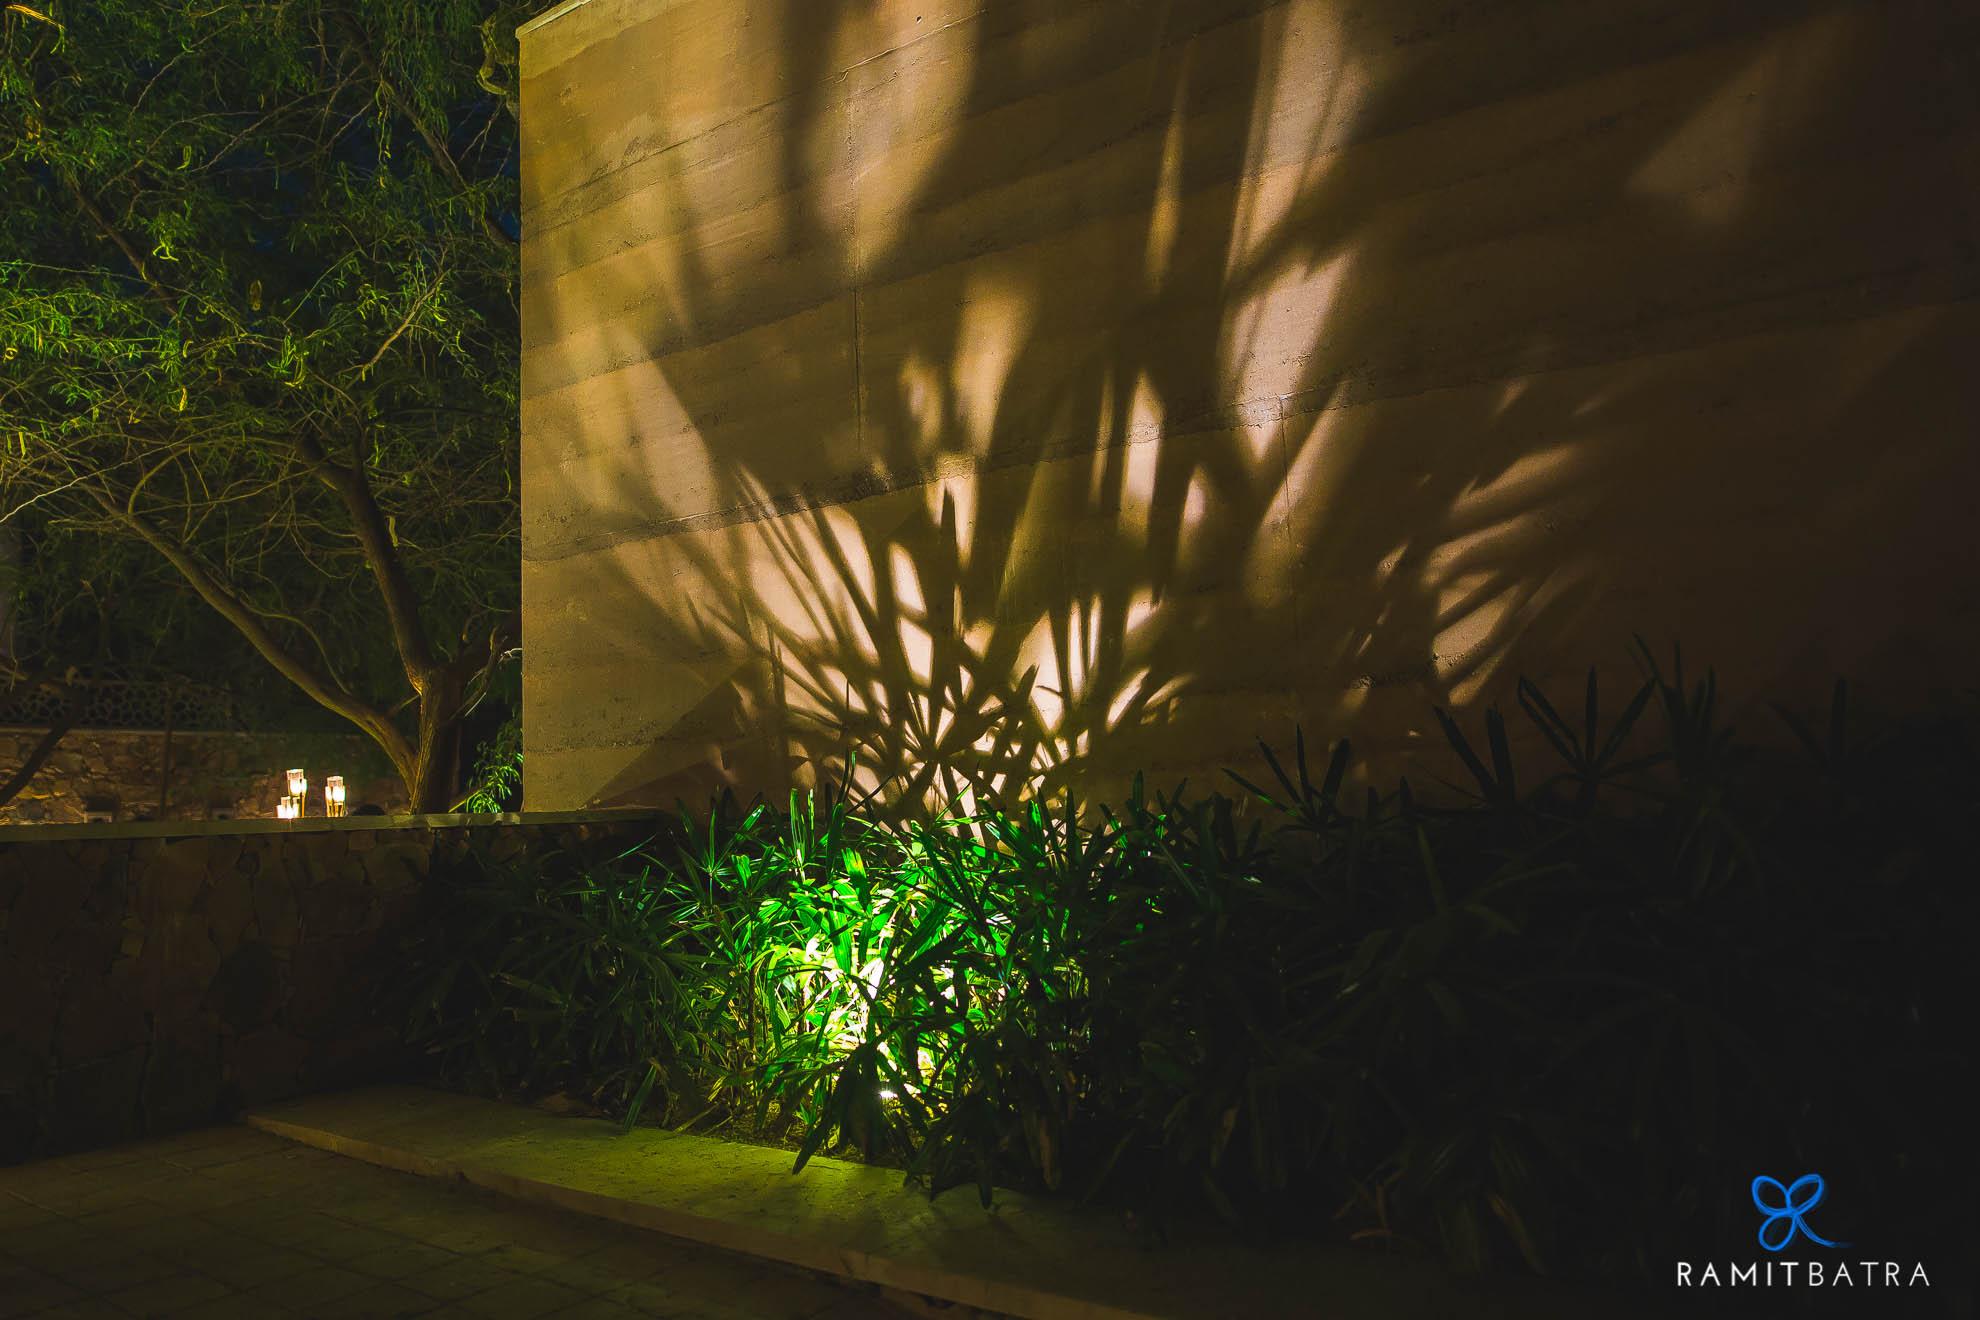 lalit-mangar-hotel-near-delhi-ramitbatra-038